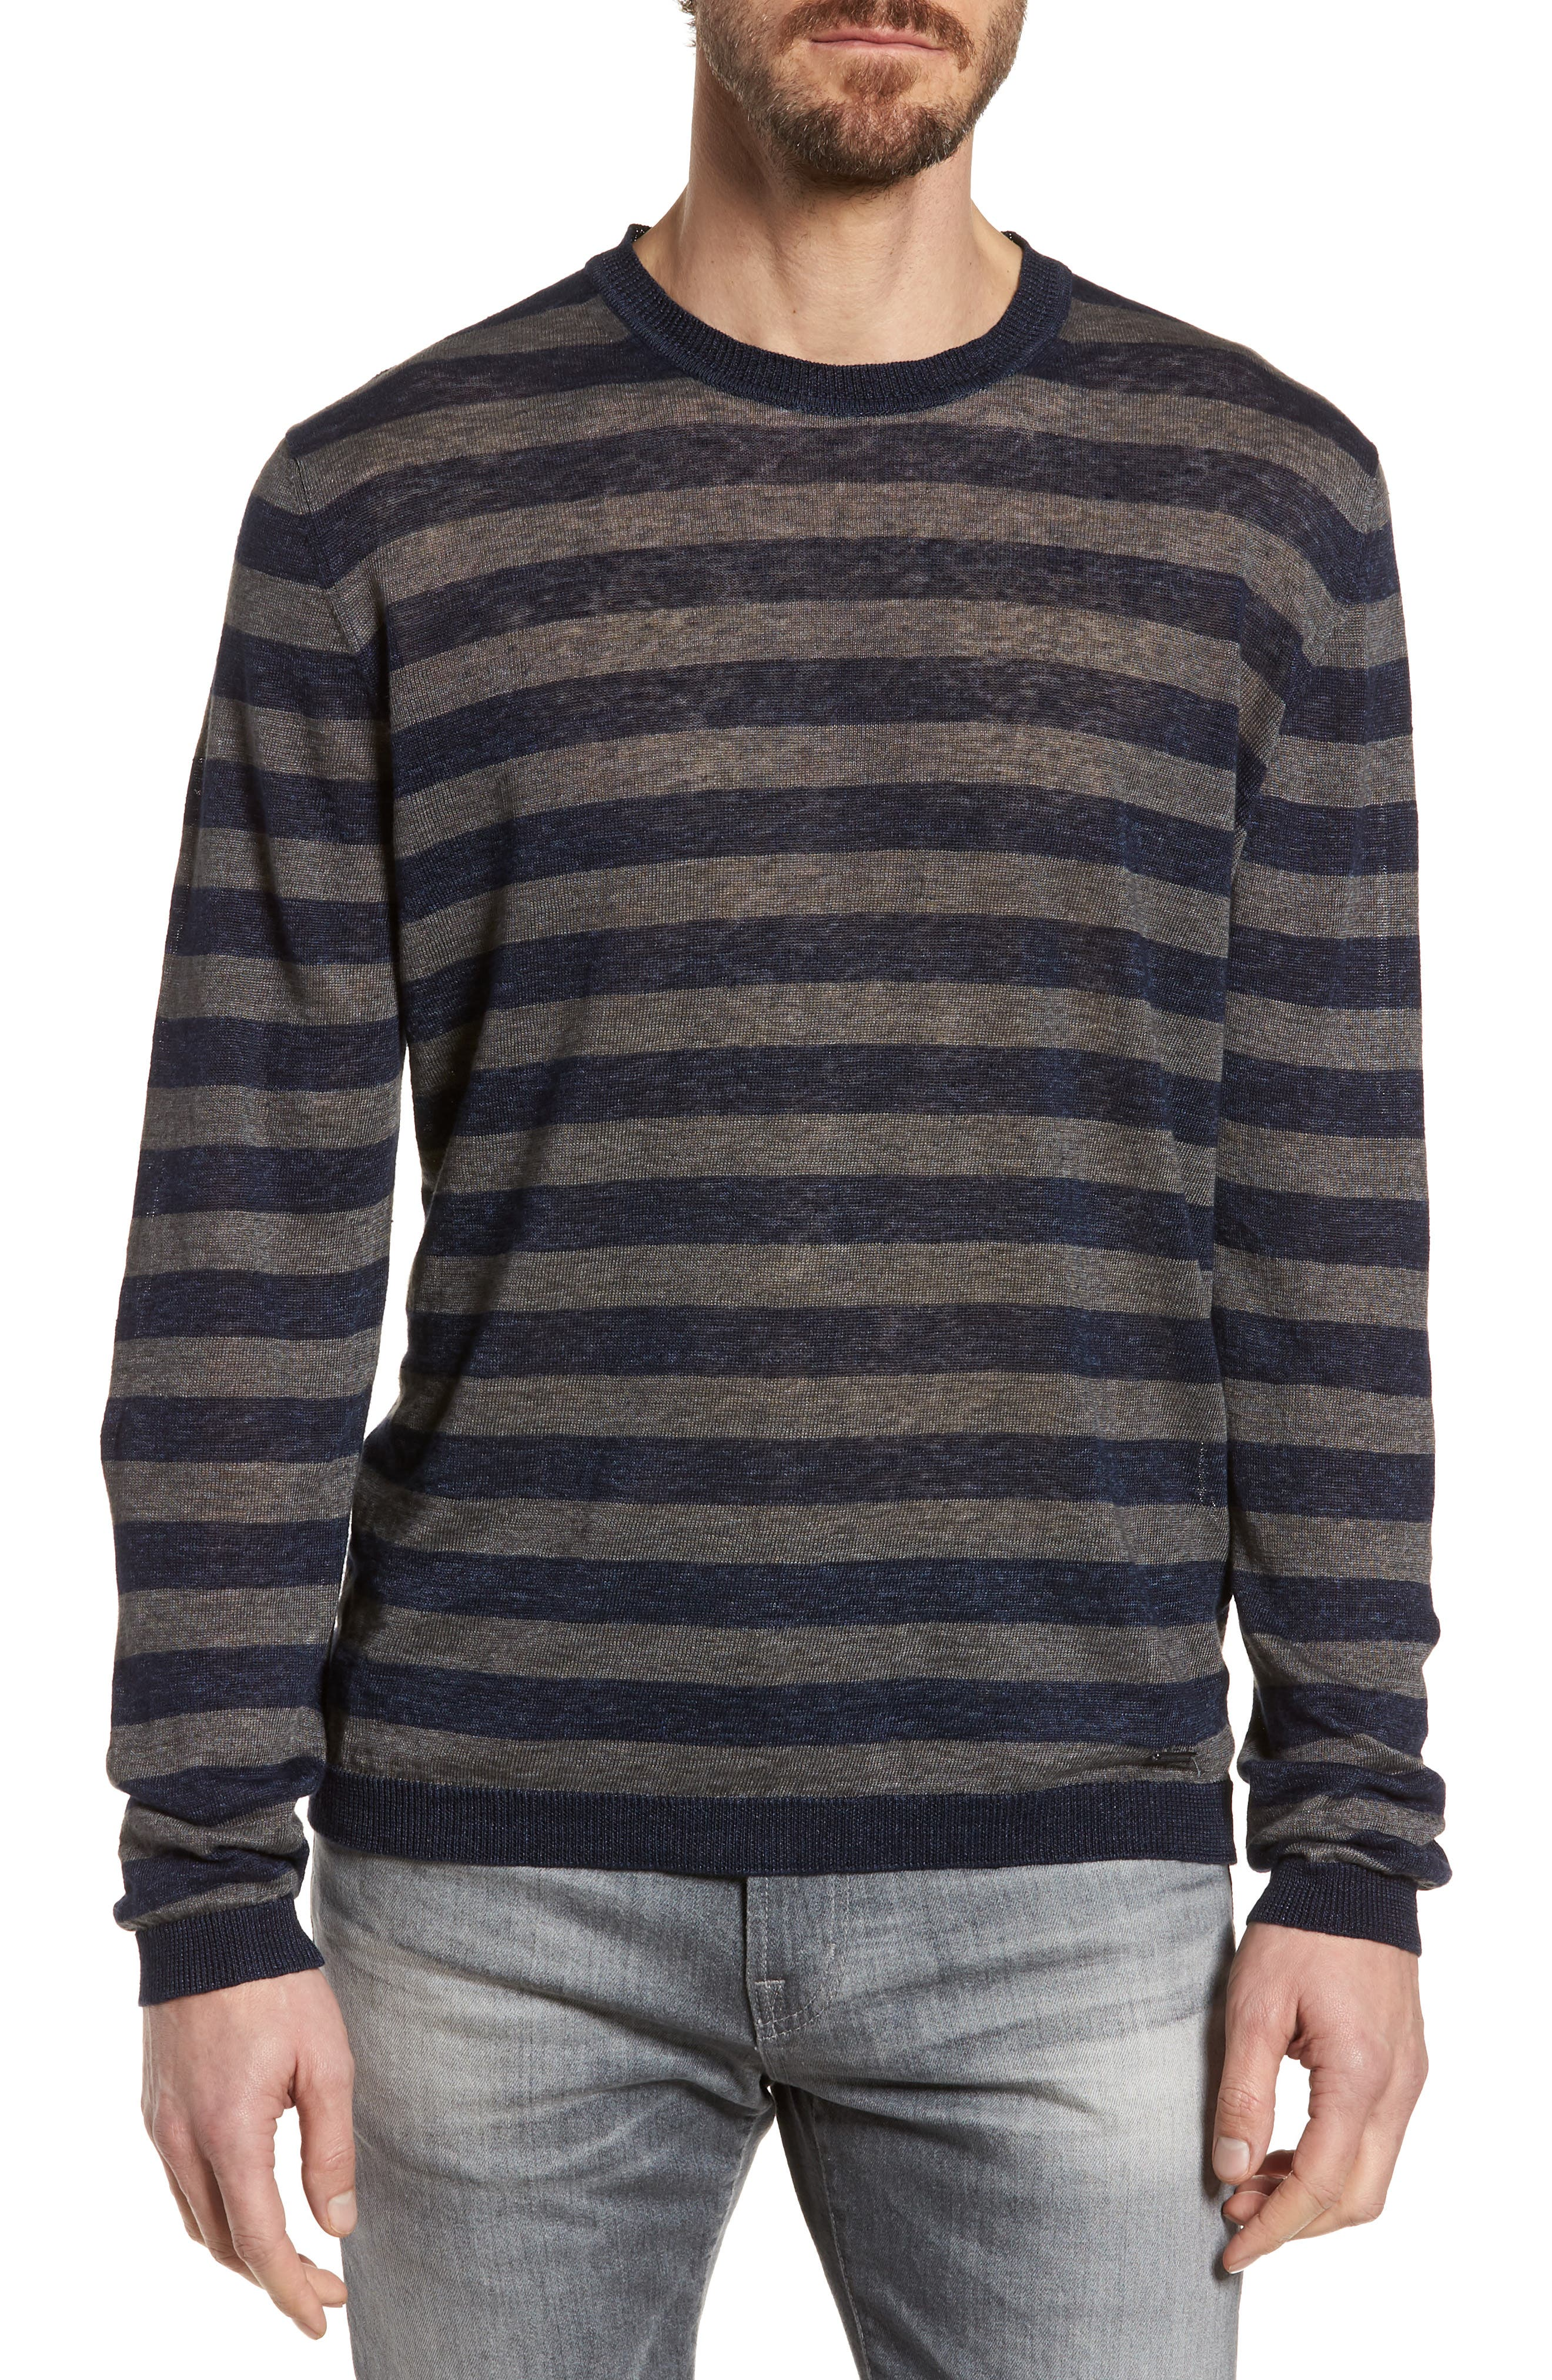 & Bros. Stripe Linen Sweater,                             Main thumbnail 1, color,                             Navy Stripe